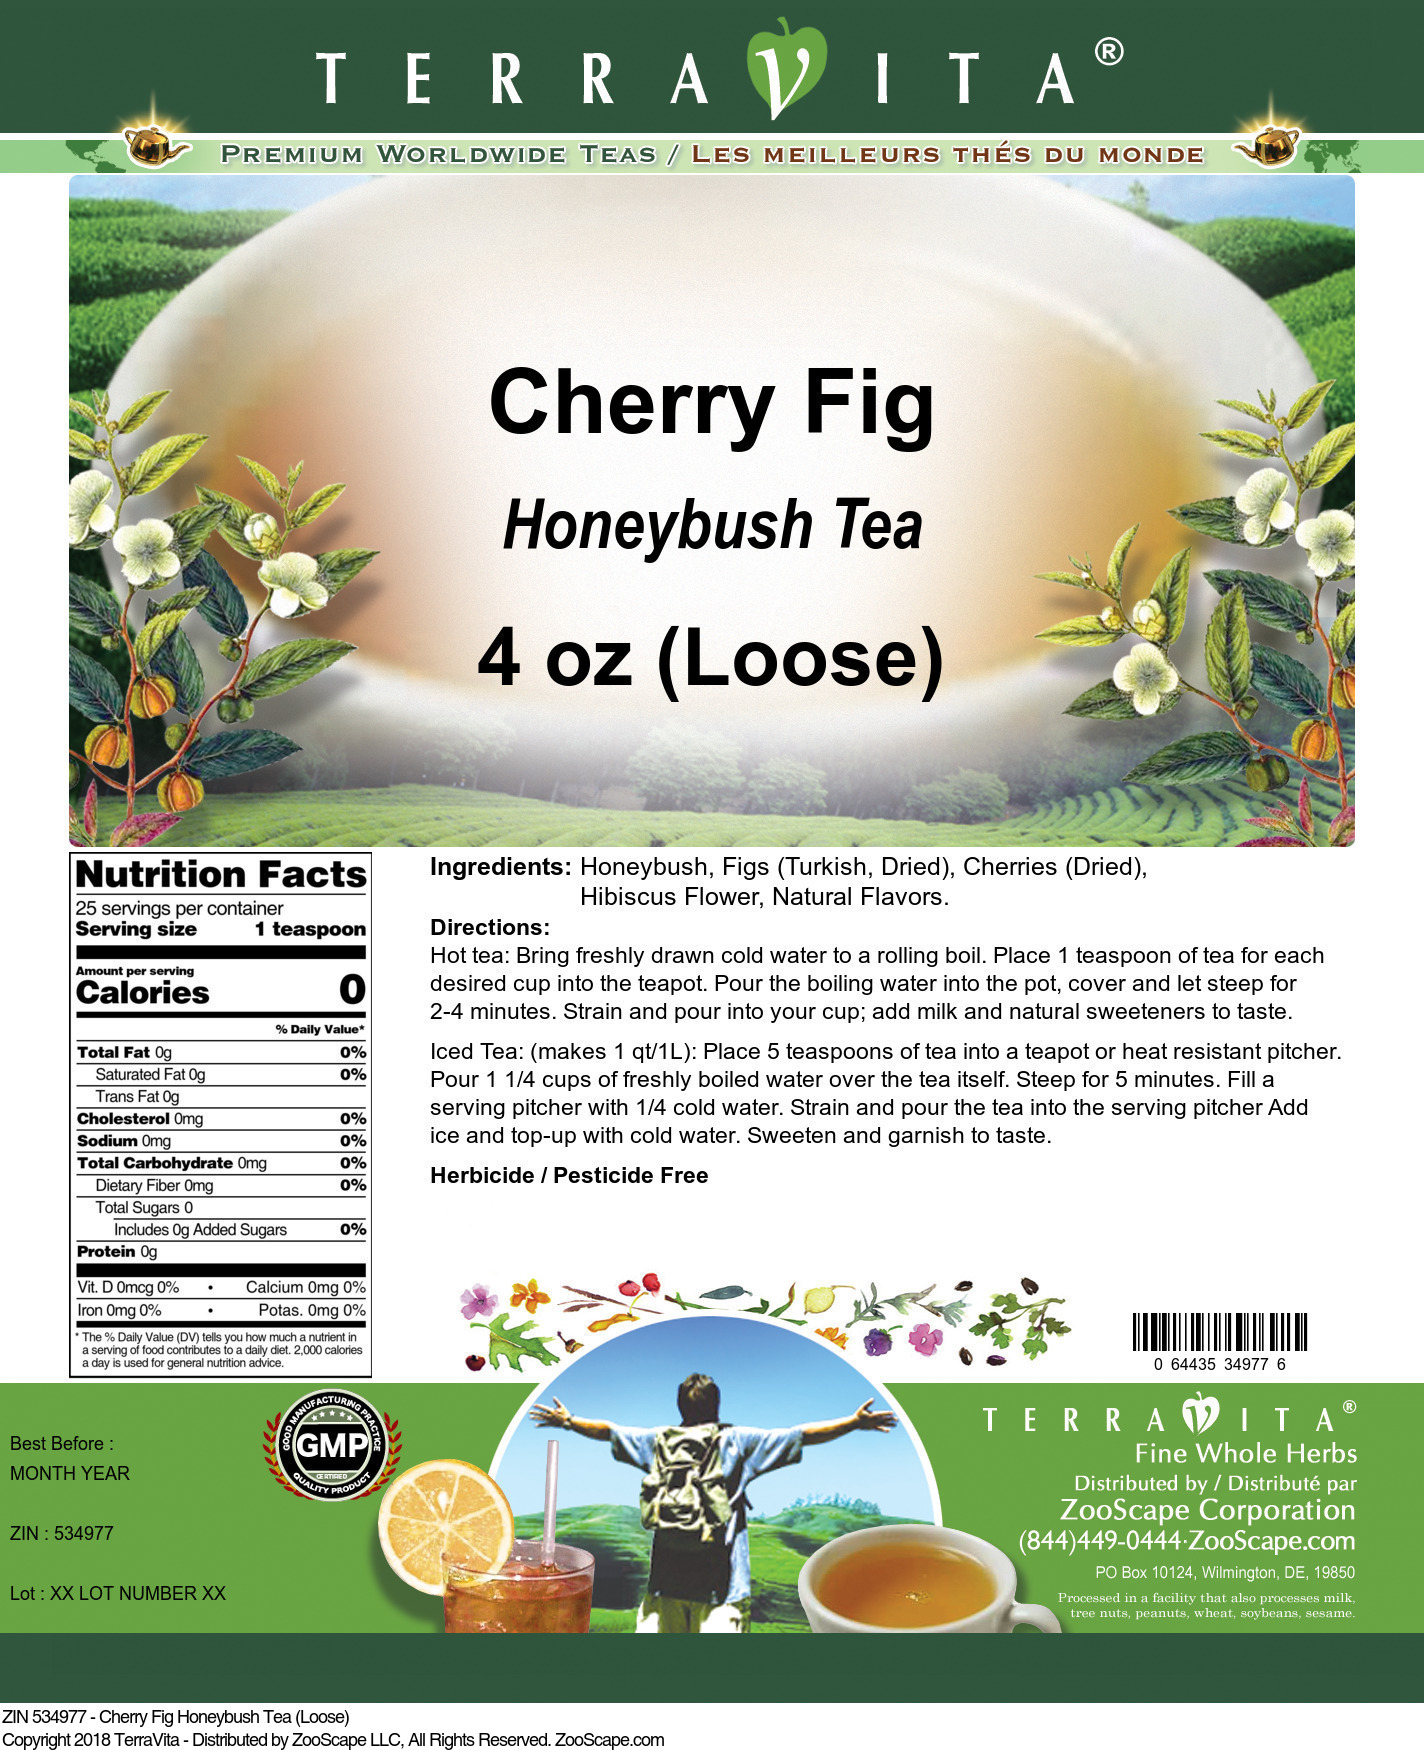 Cherry Fig Honeybush Tea (Loose)